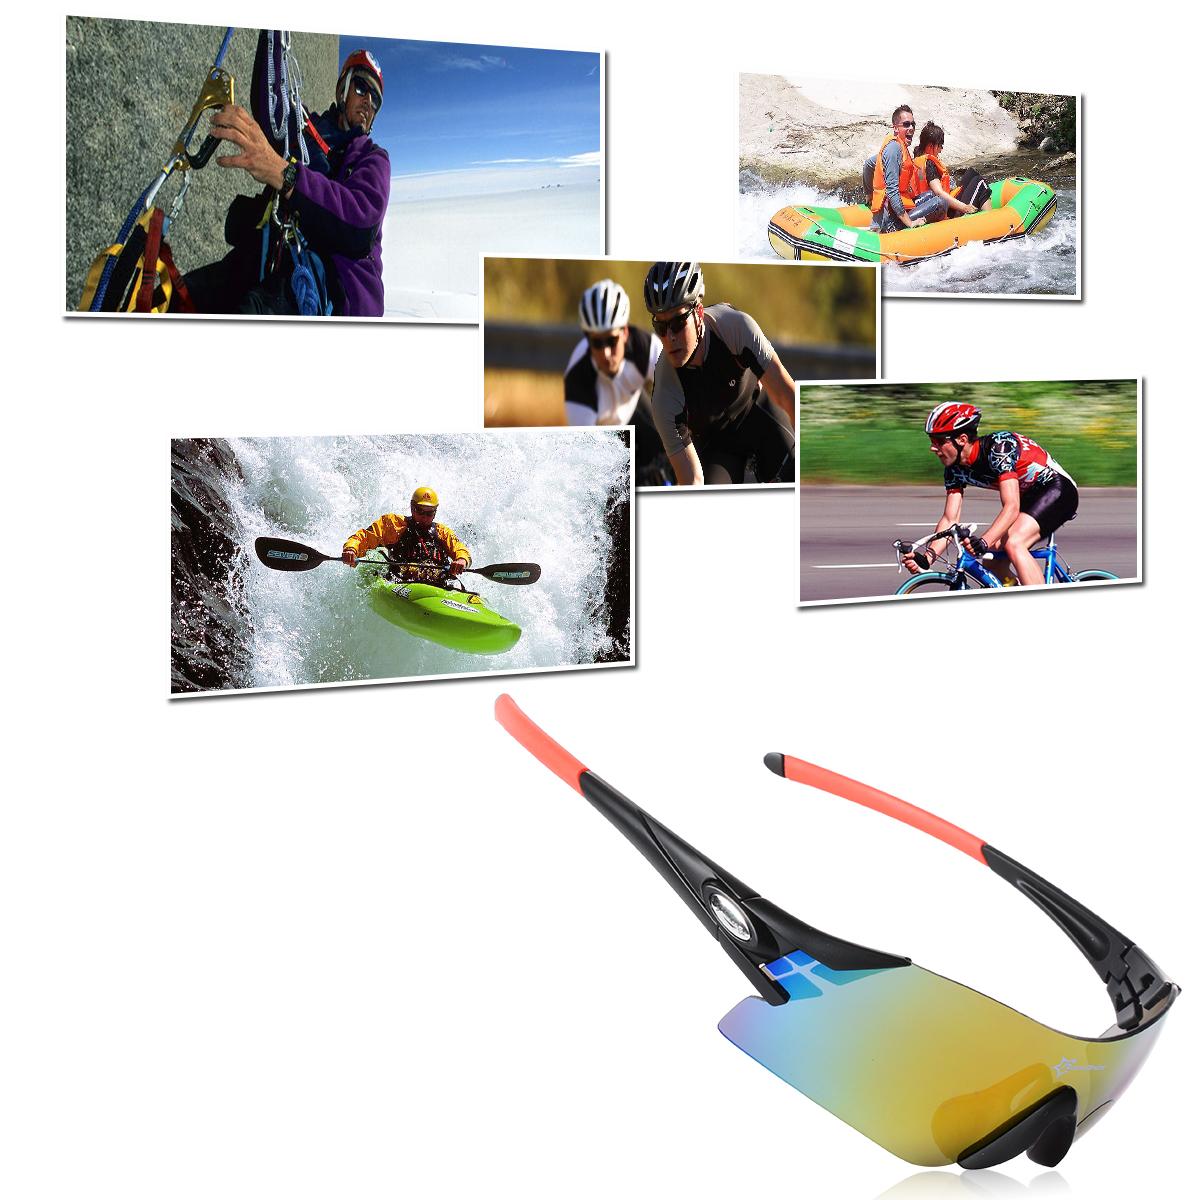 ROCKBROS Cycling glasses Driving Fishing gafas ciclismo Bicycle Bike Glasses Sunglasses for men TR90 Goggles Eyewear(China (Mainland))